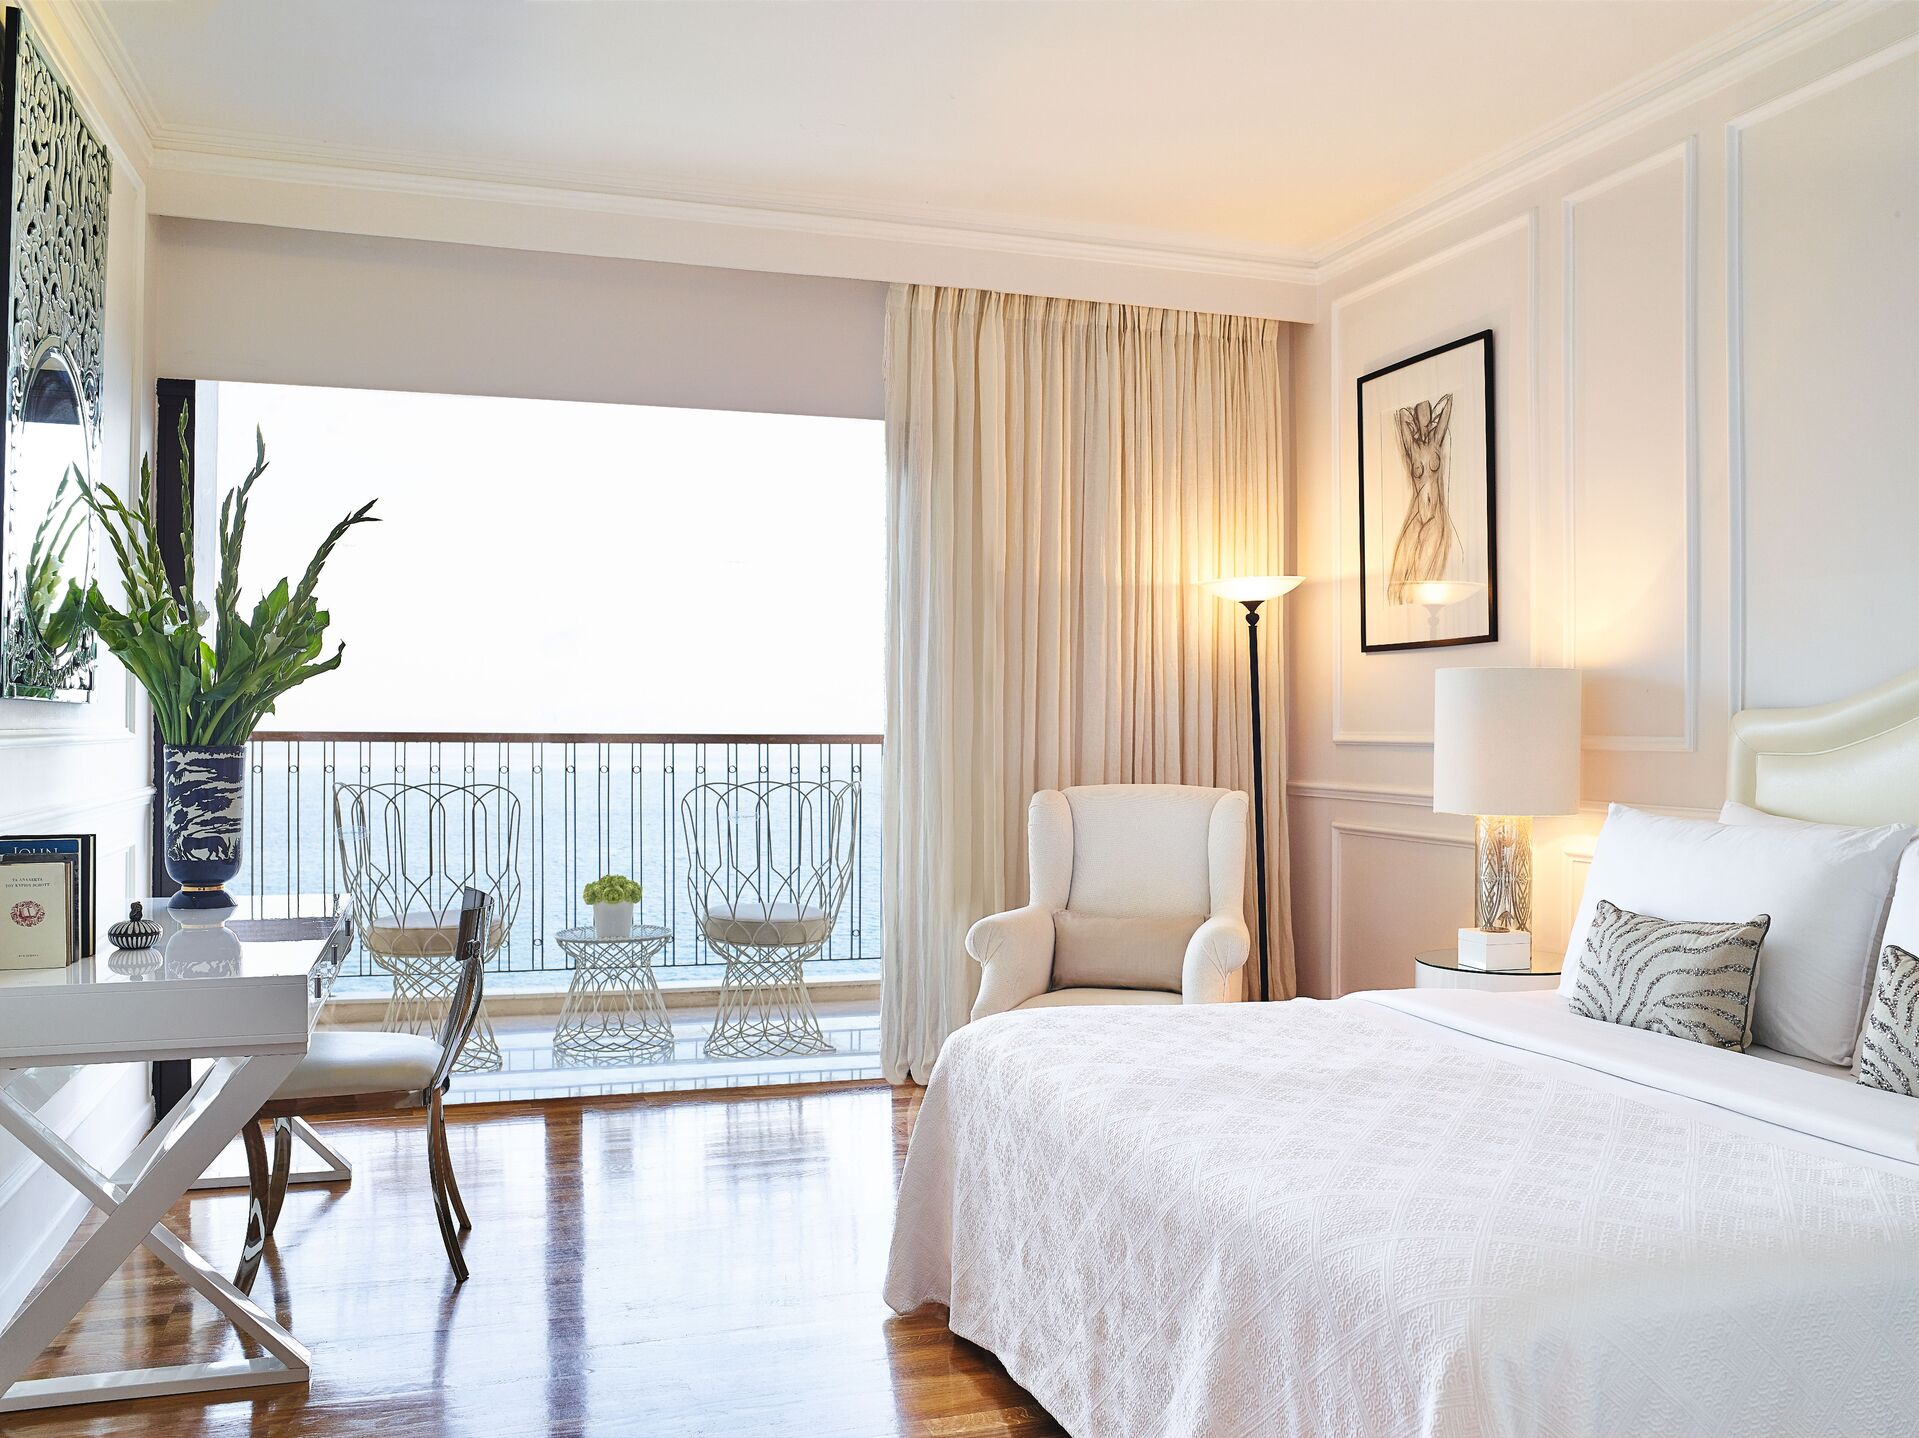 https://cms.satur.sk/data/imgs/tour_image/orig/21-cruise-guestroom-sea-view_72dpi-1-1943085.jpg